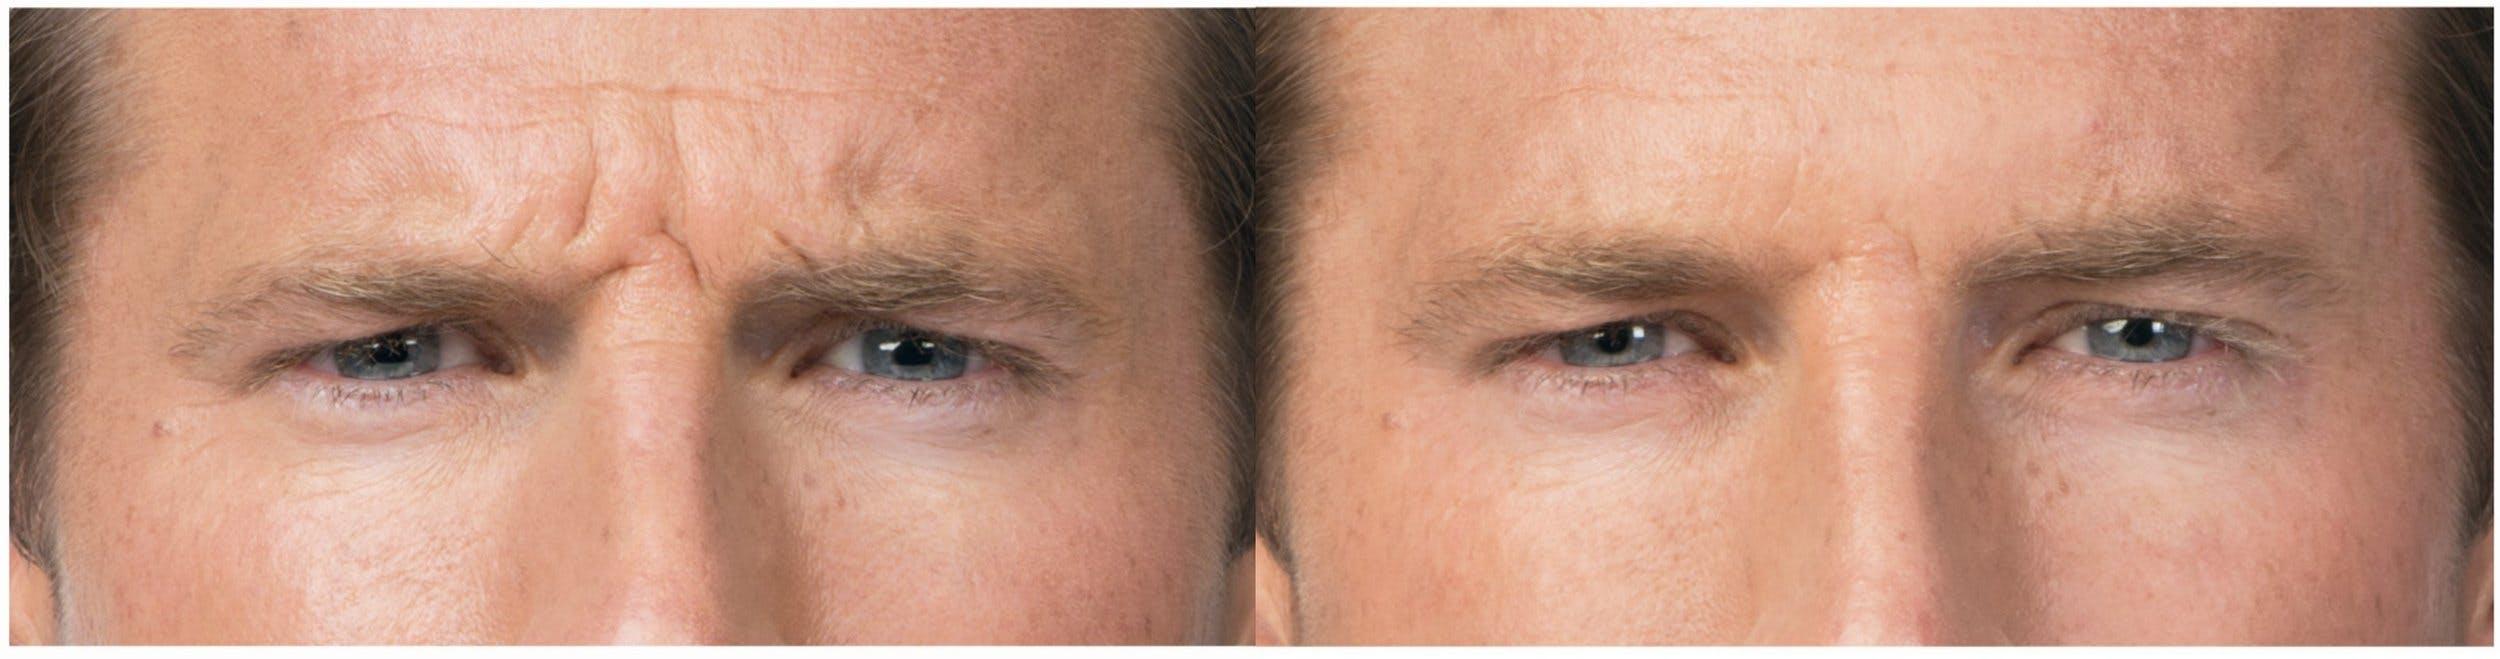 Botox & Dysport Gallery - Patient 58178943 - Image 2